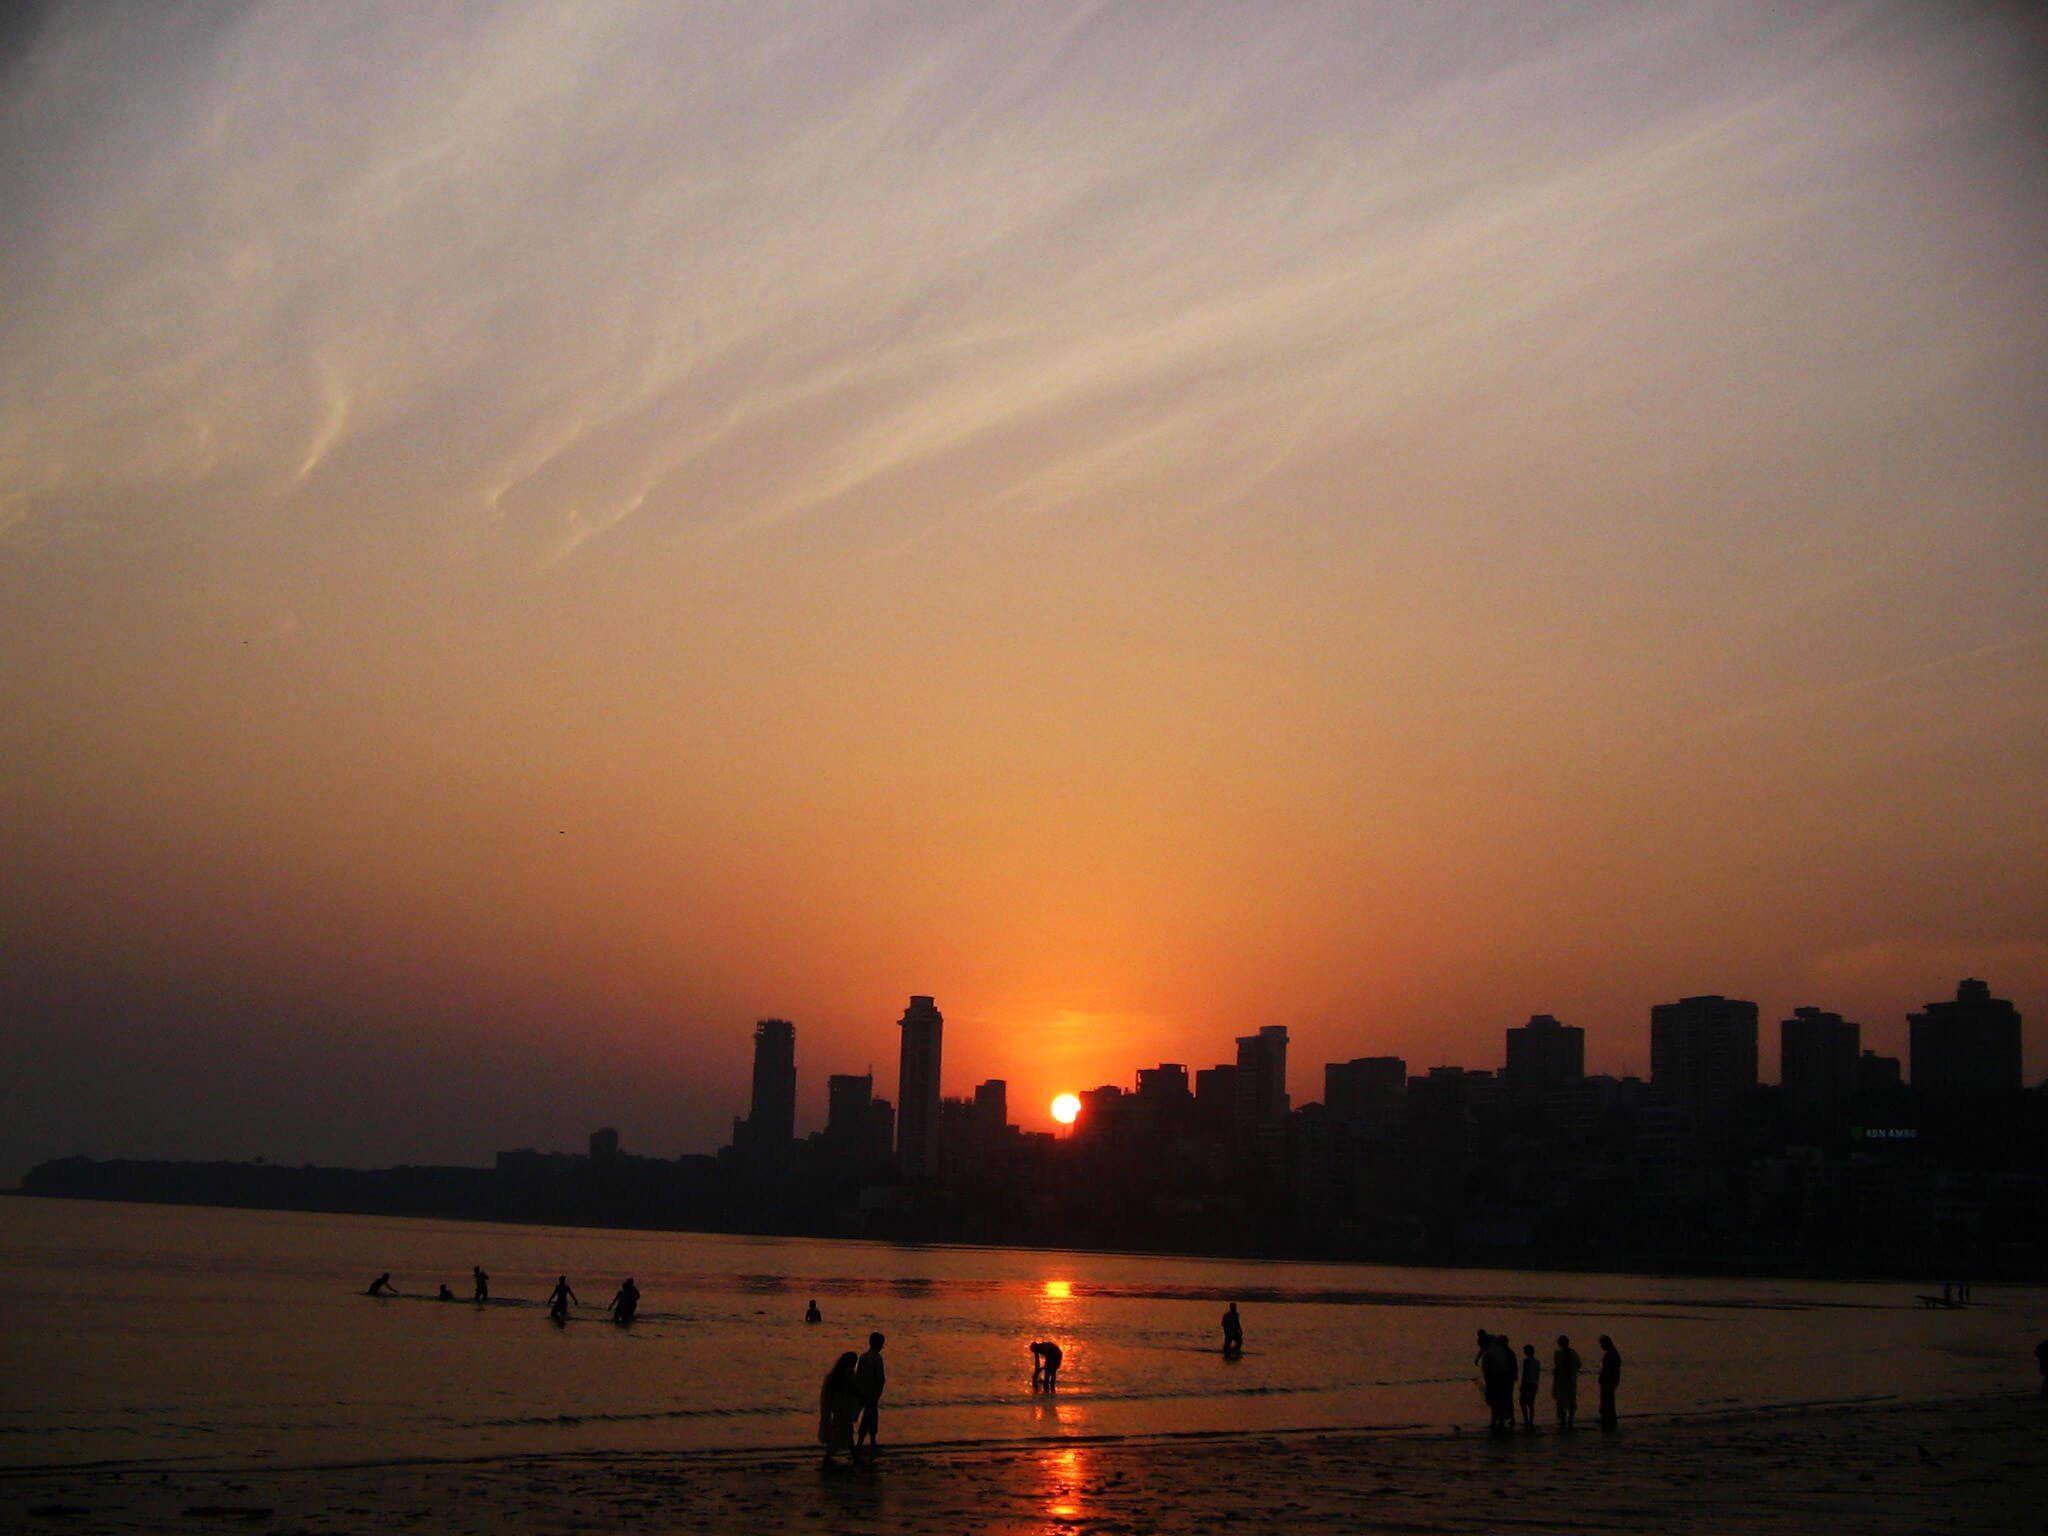 People bathe in the sea as the sun sets on Mumbai beach